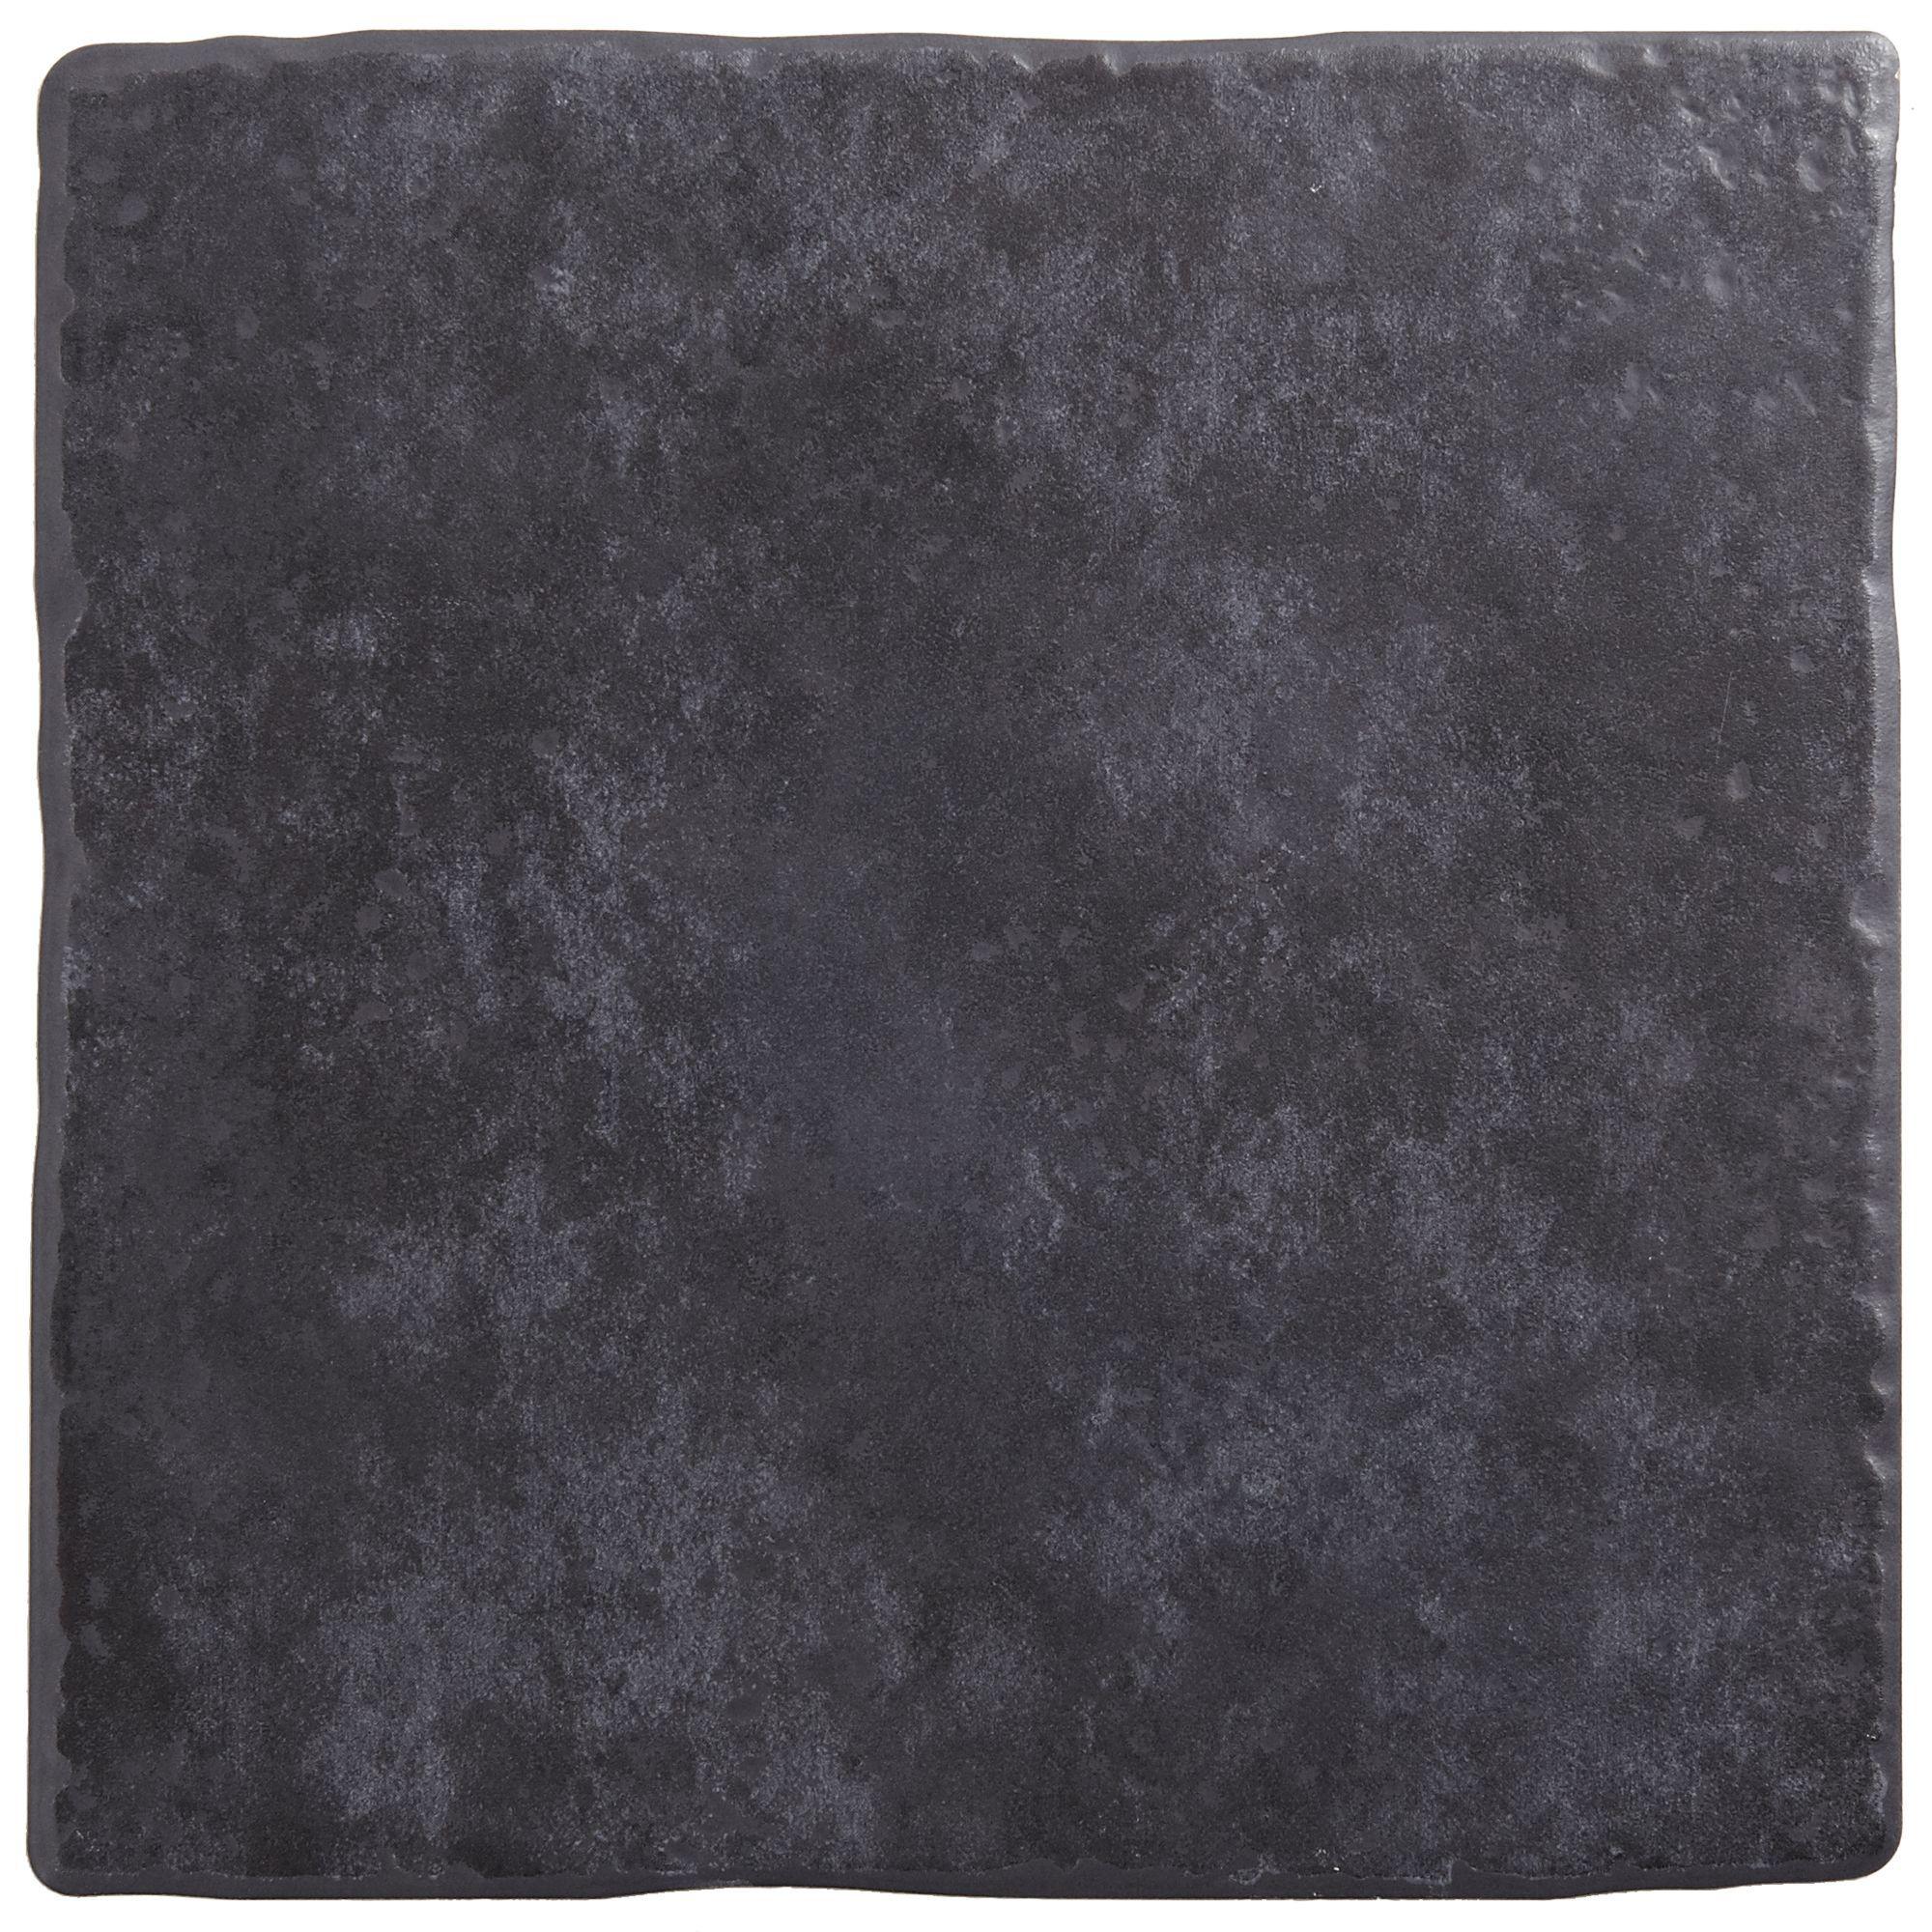 Calcuta Black Stone Effect Ceramic Floor Tile Pack Of 9 L 330mm